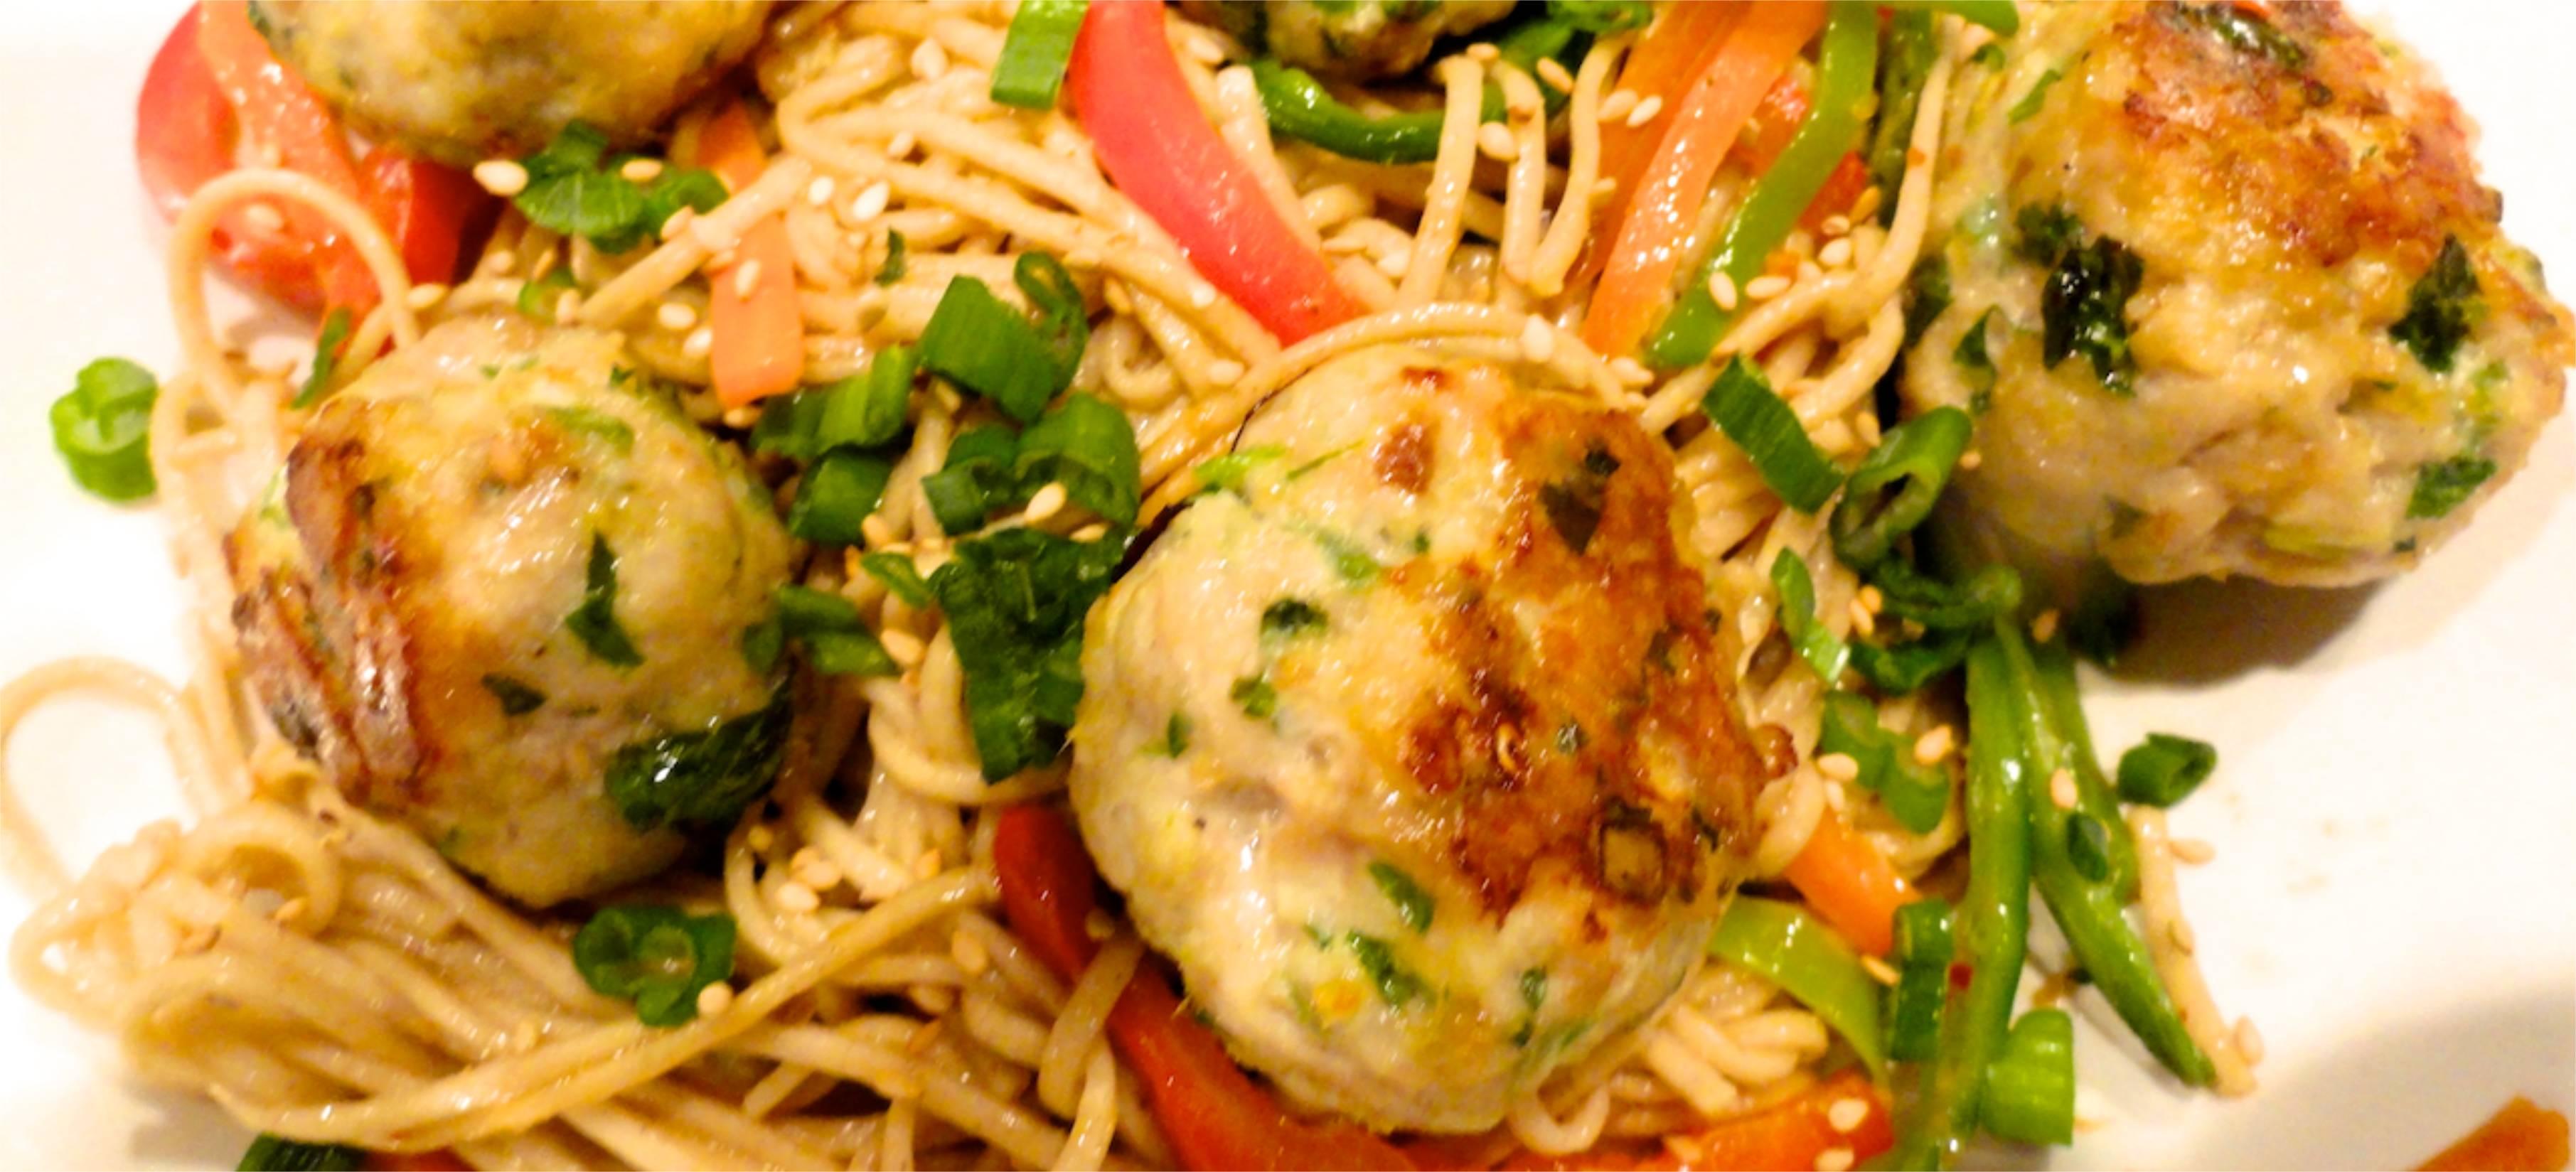 Asian Meatballs With Peanut Sauce Recipes — Dishmaps